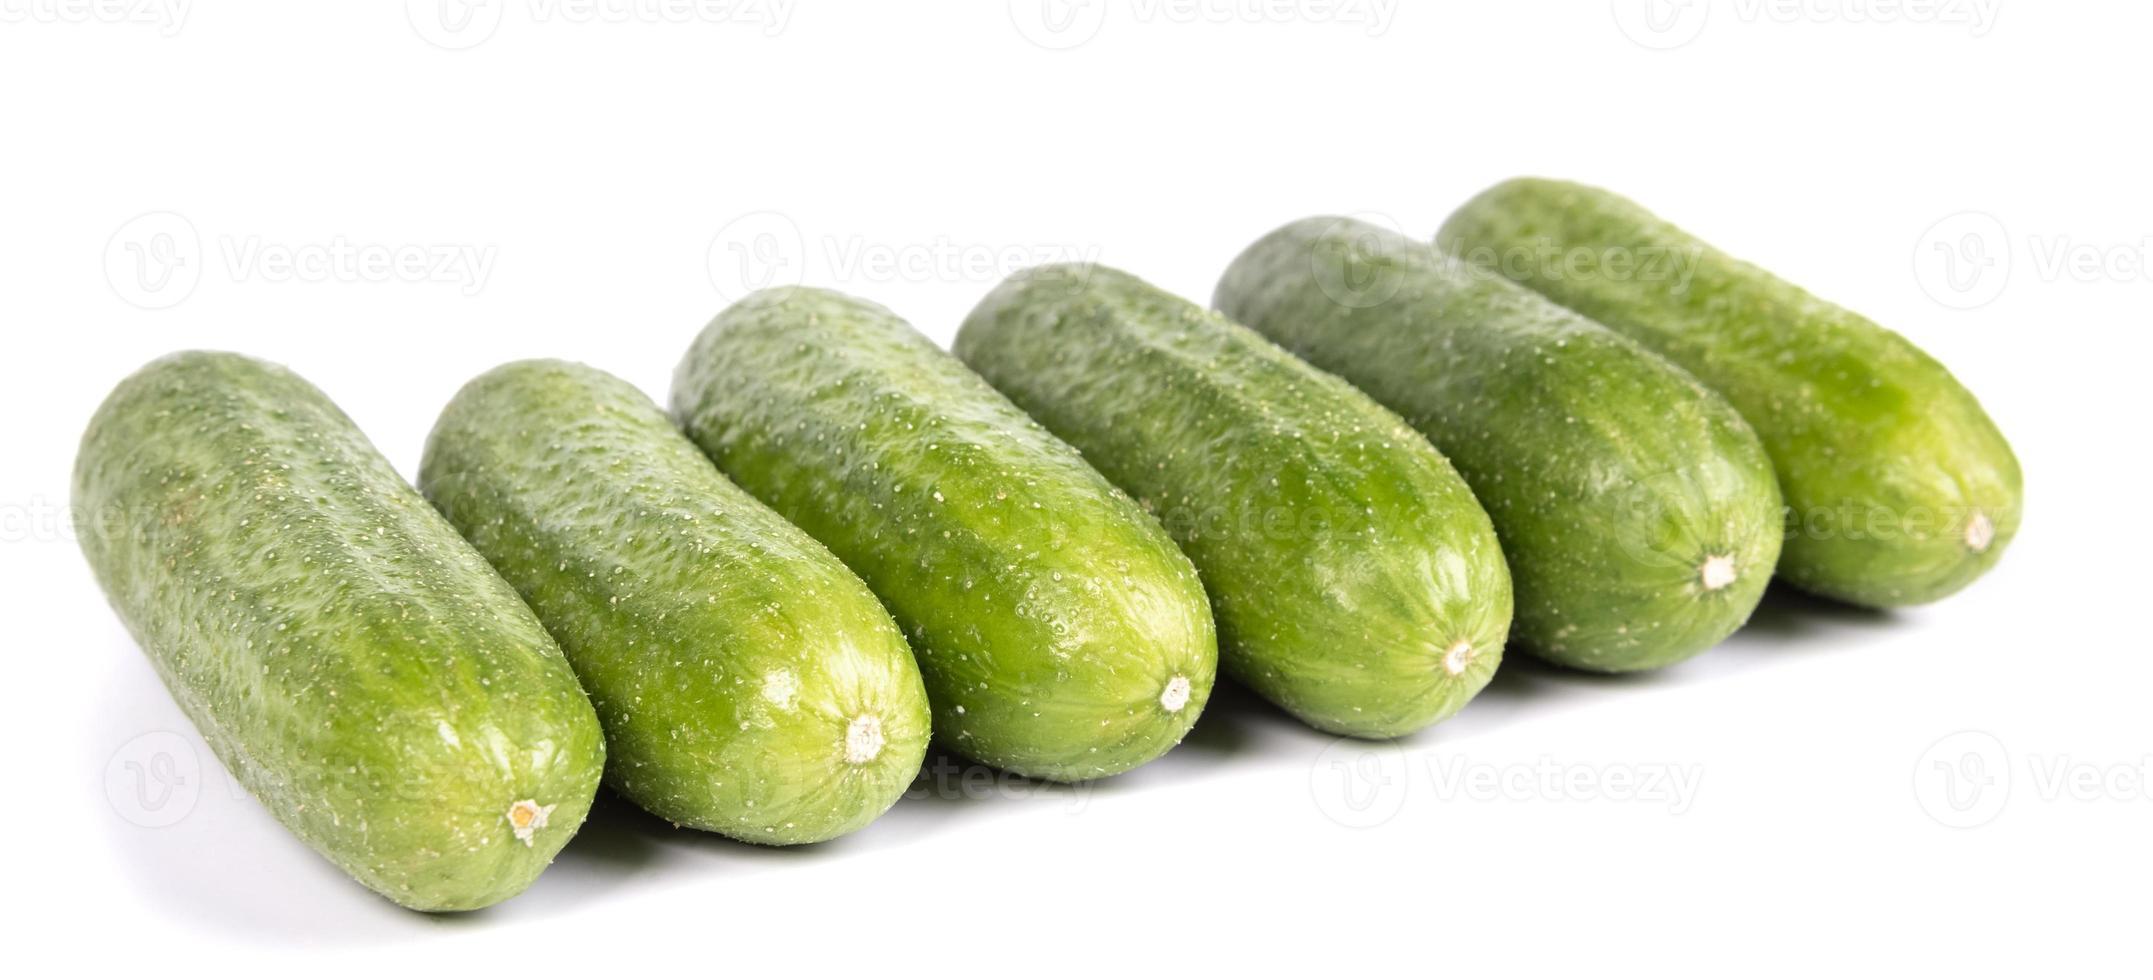 pepino verde foto